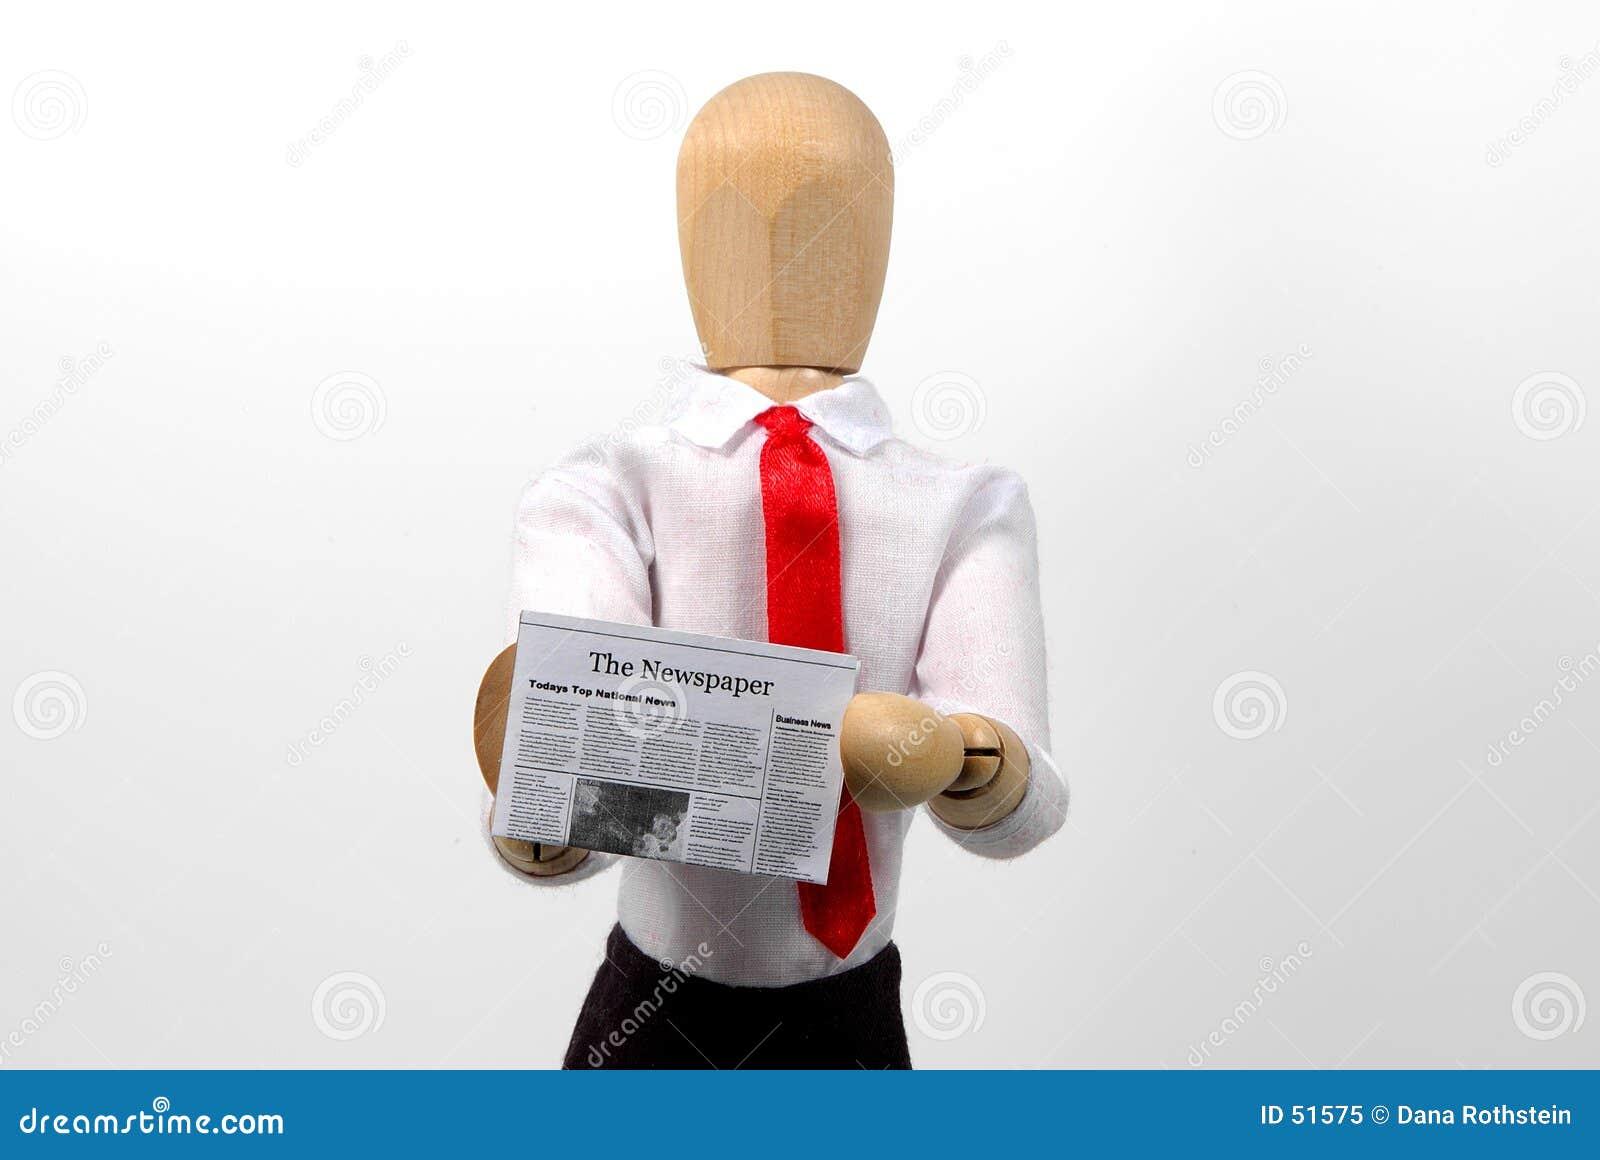 Dagens nyheterna